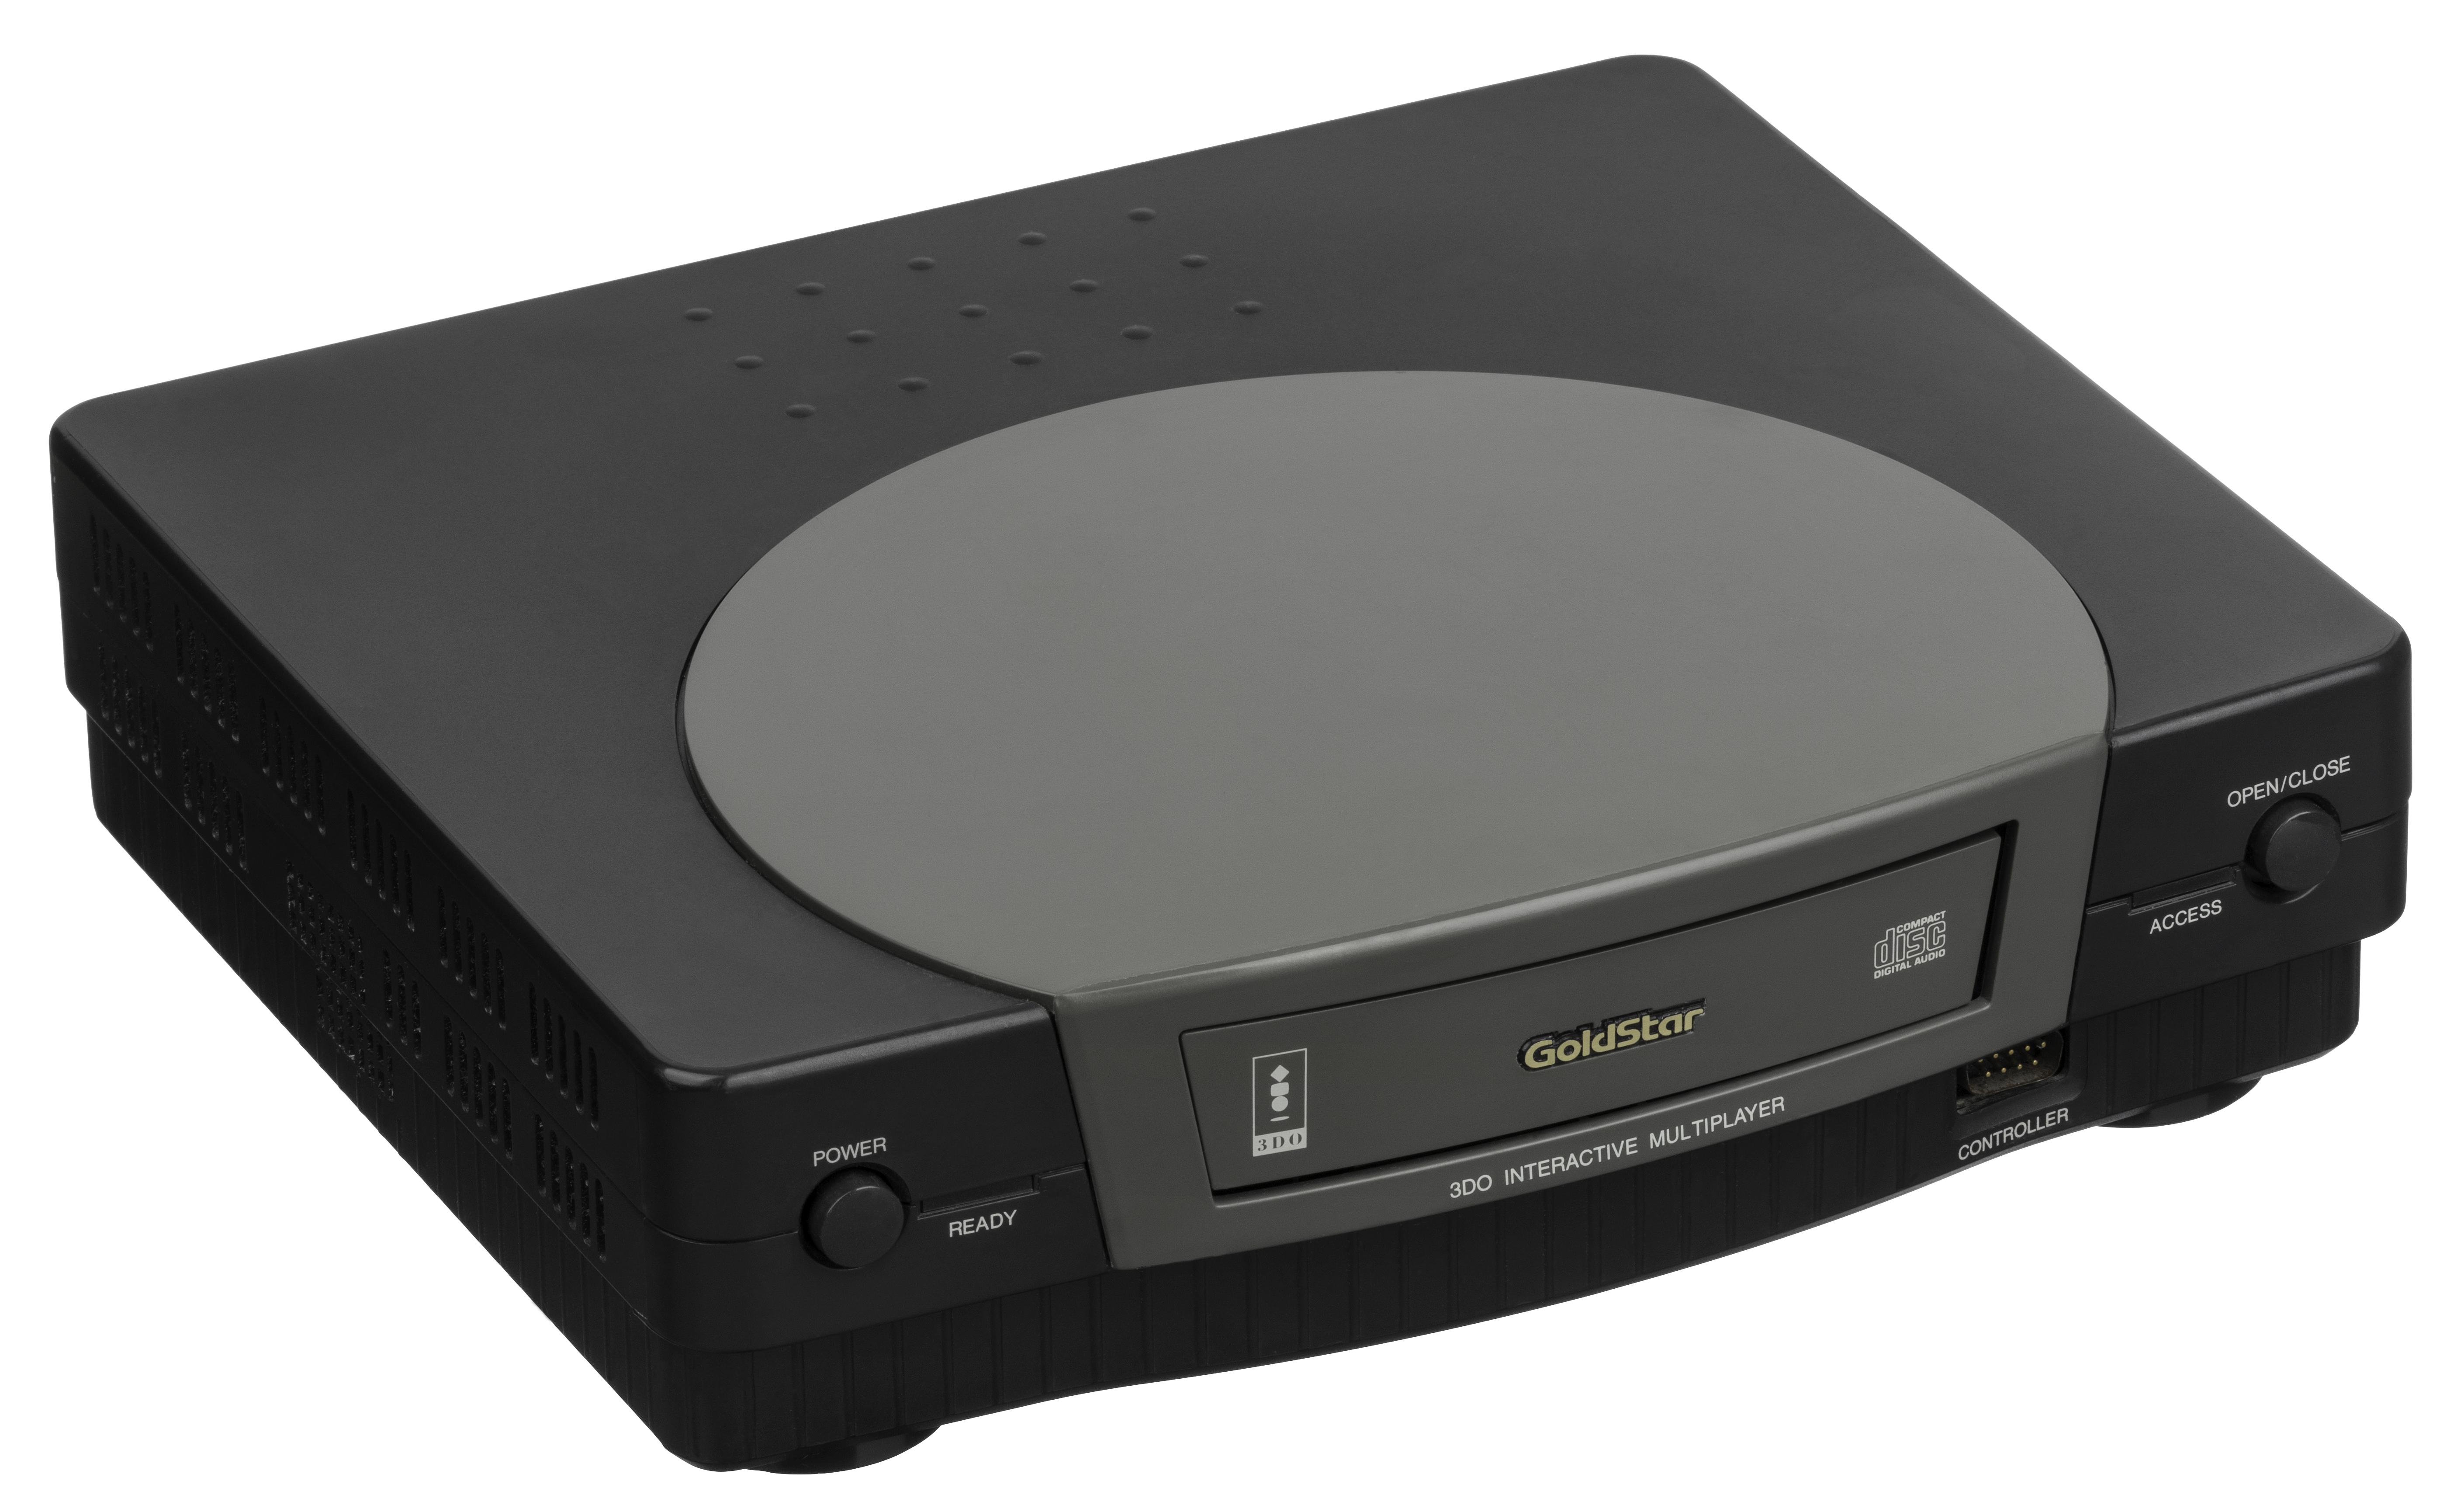 File:3DO-Goldstar-Console-FR jpg - Wikimedia Commons